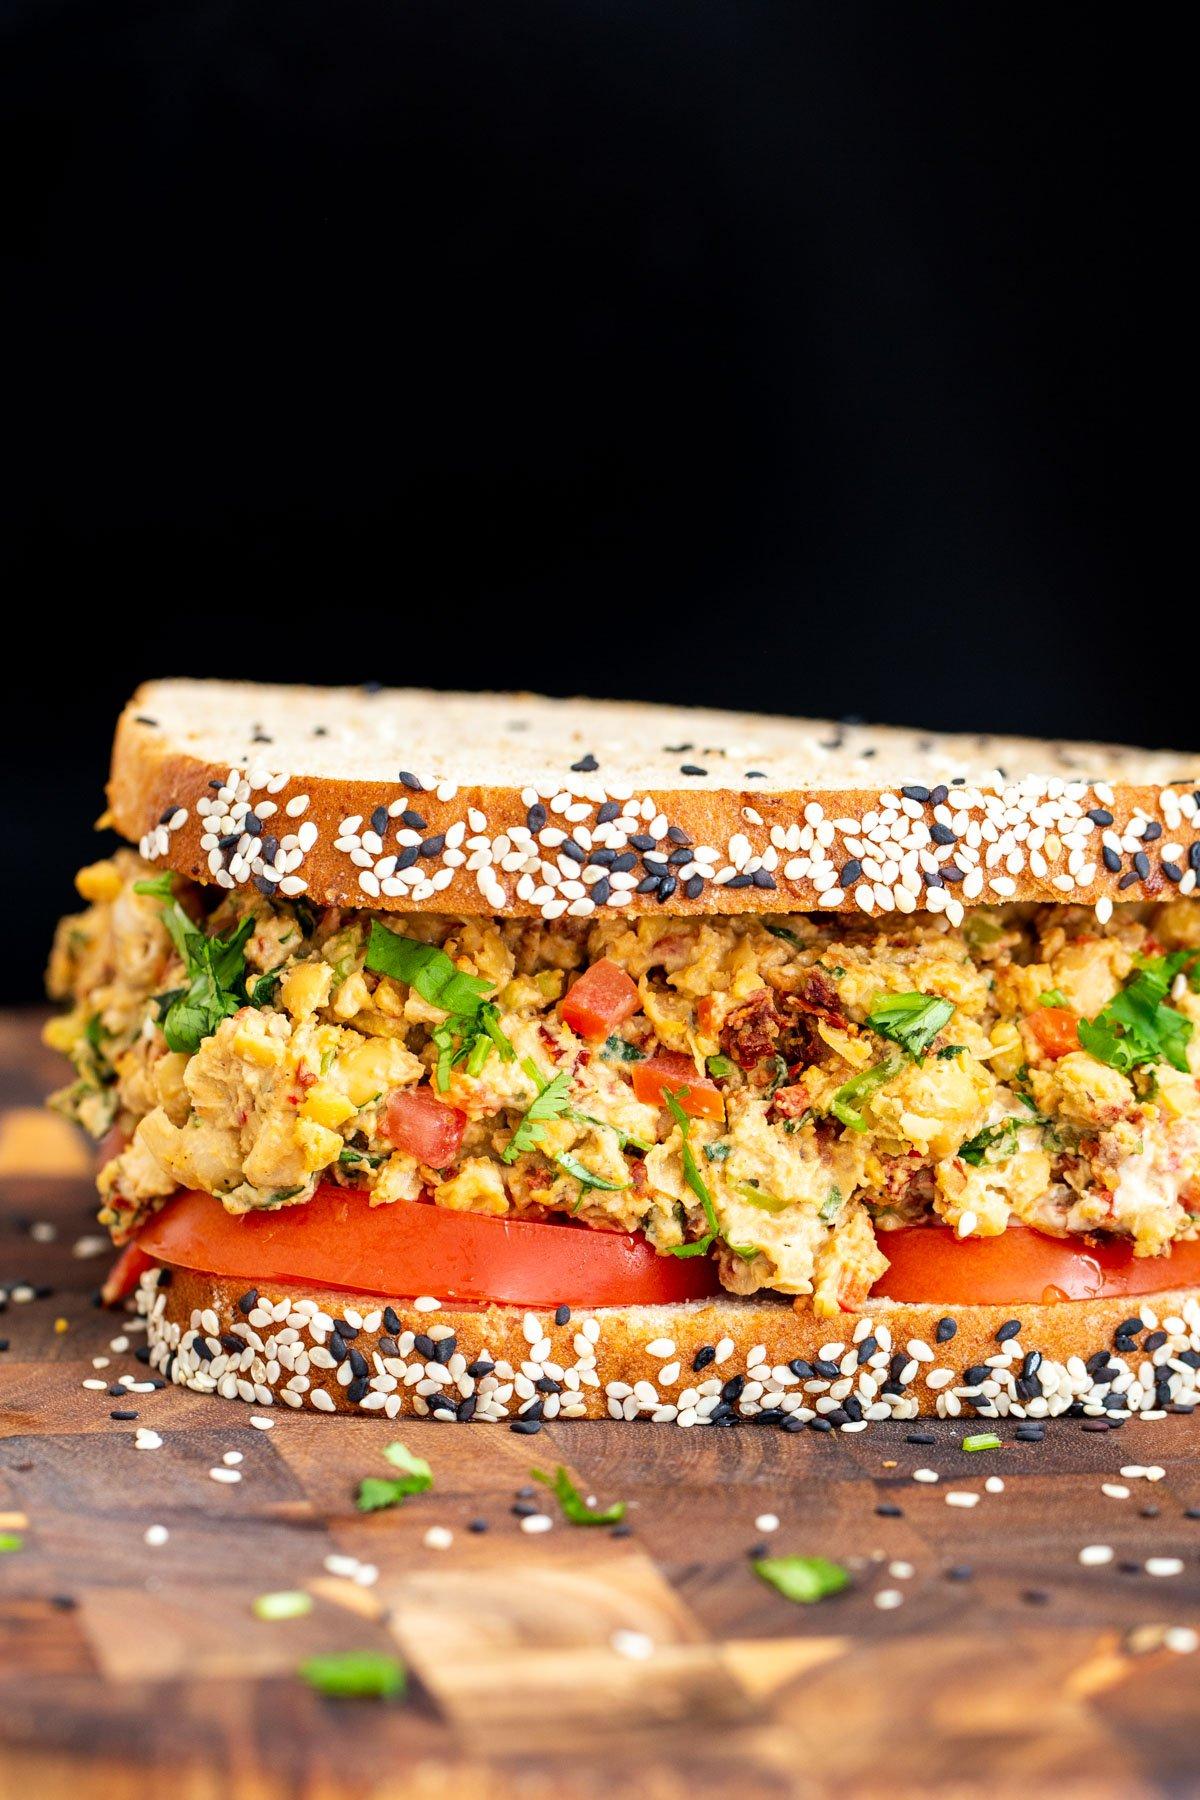 close up side view of vegan Mediterranean chickpea sandwich